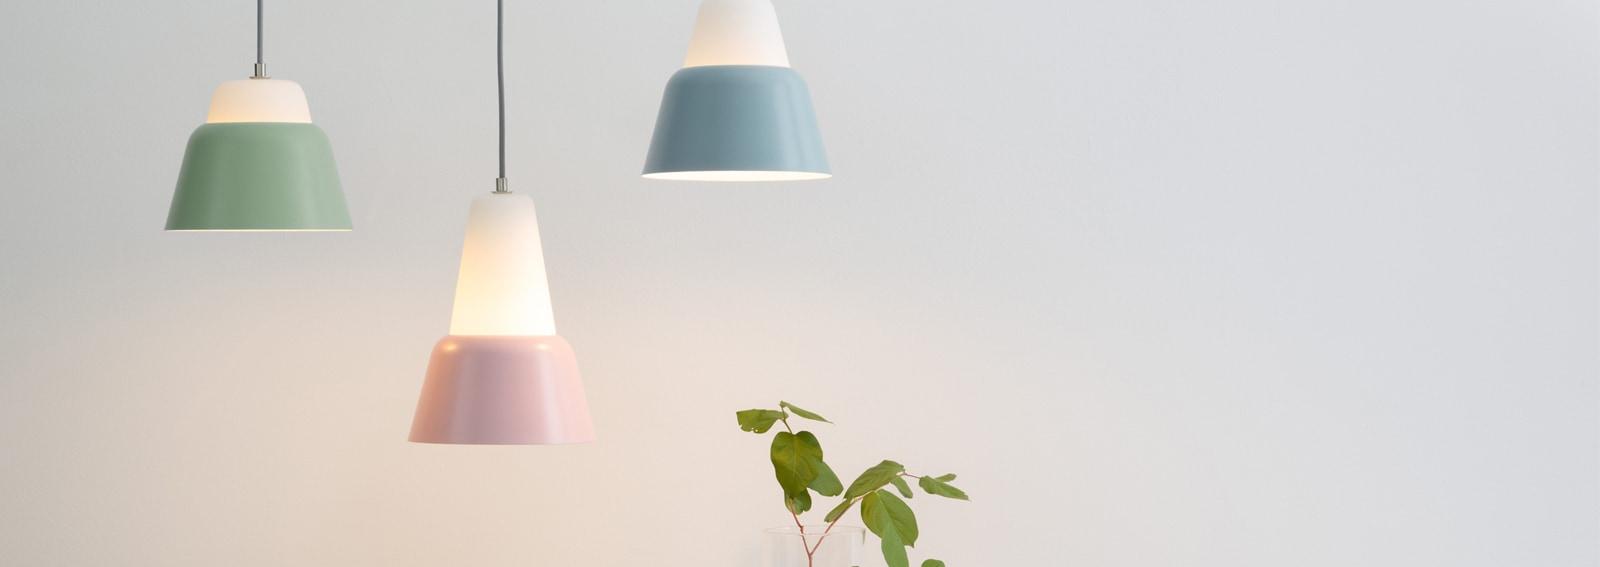 Lampadari Per Casa Al Mare 10 lampadari moderni per tutti i budget - grazia.it